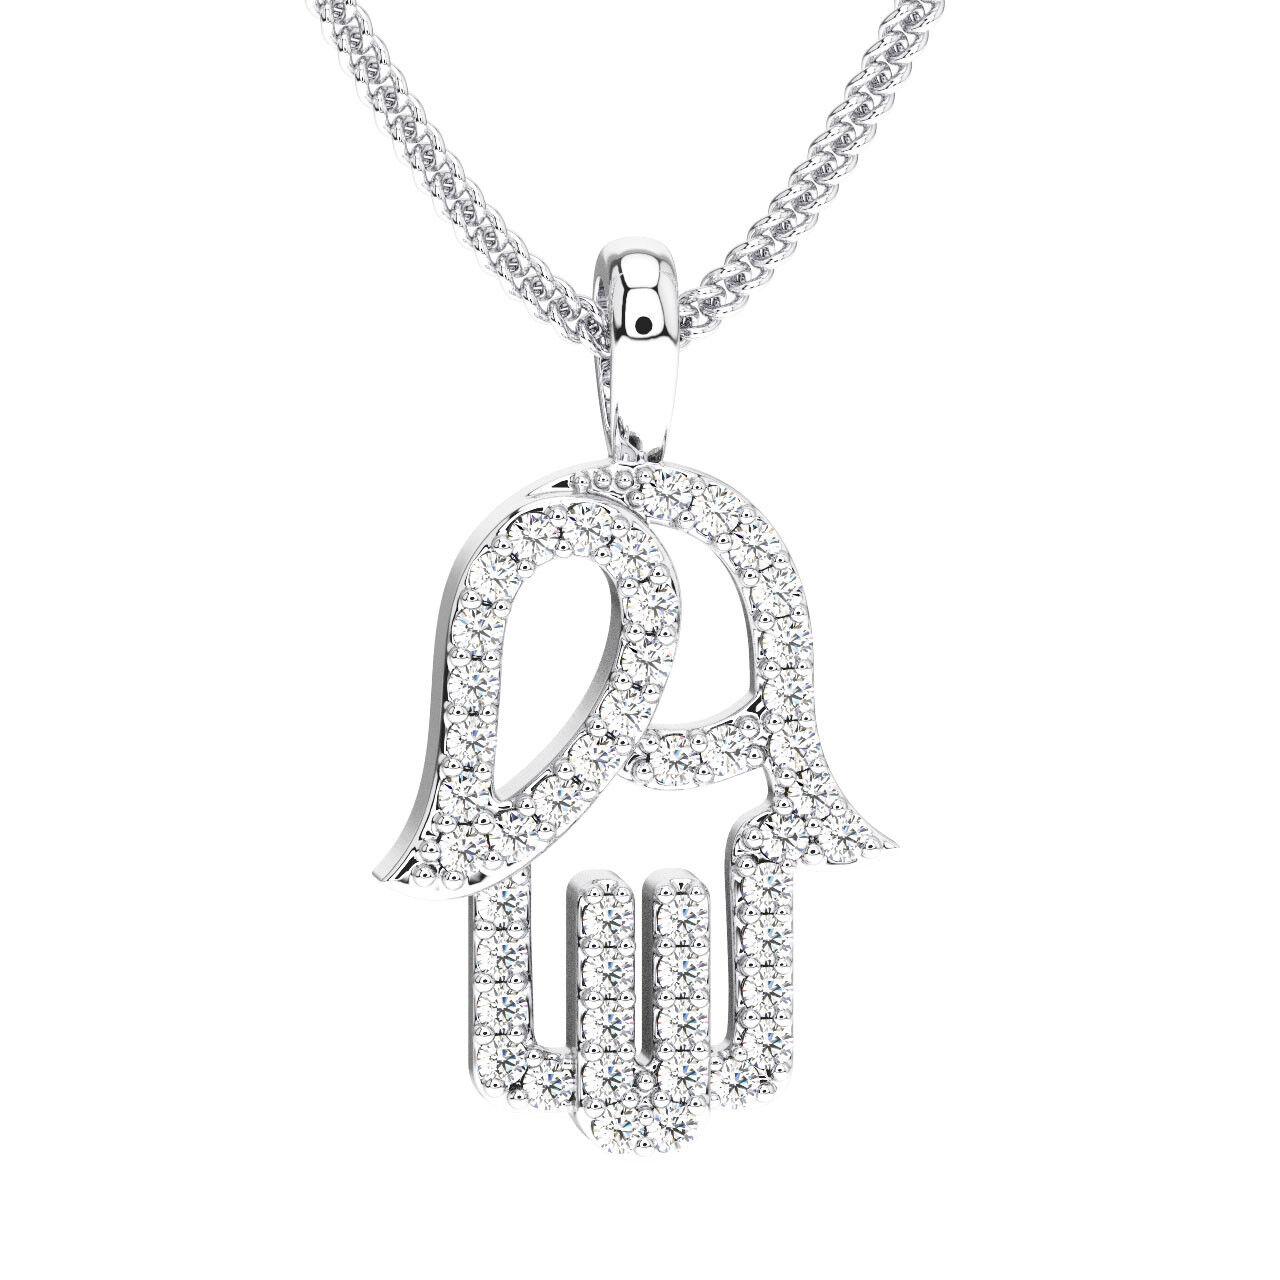 0.25 Carat Round Brilliant Cut Diamonds Hamsa Evil Hand Pendant In 18K gold